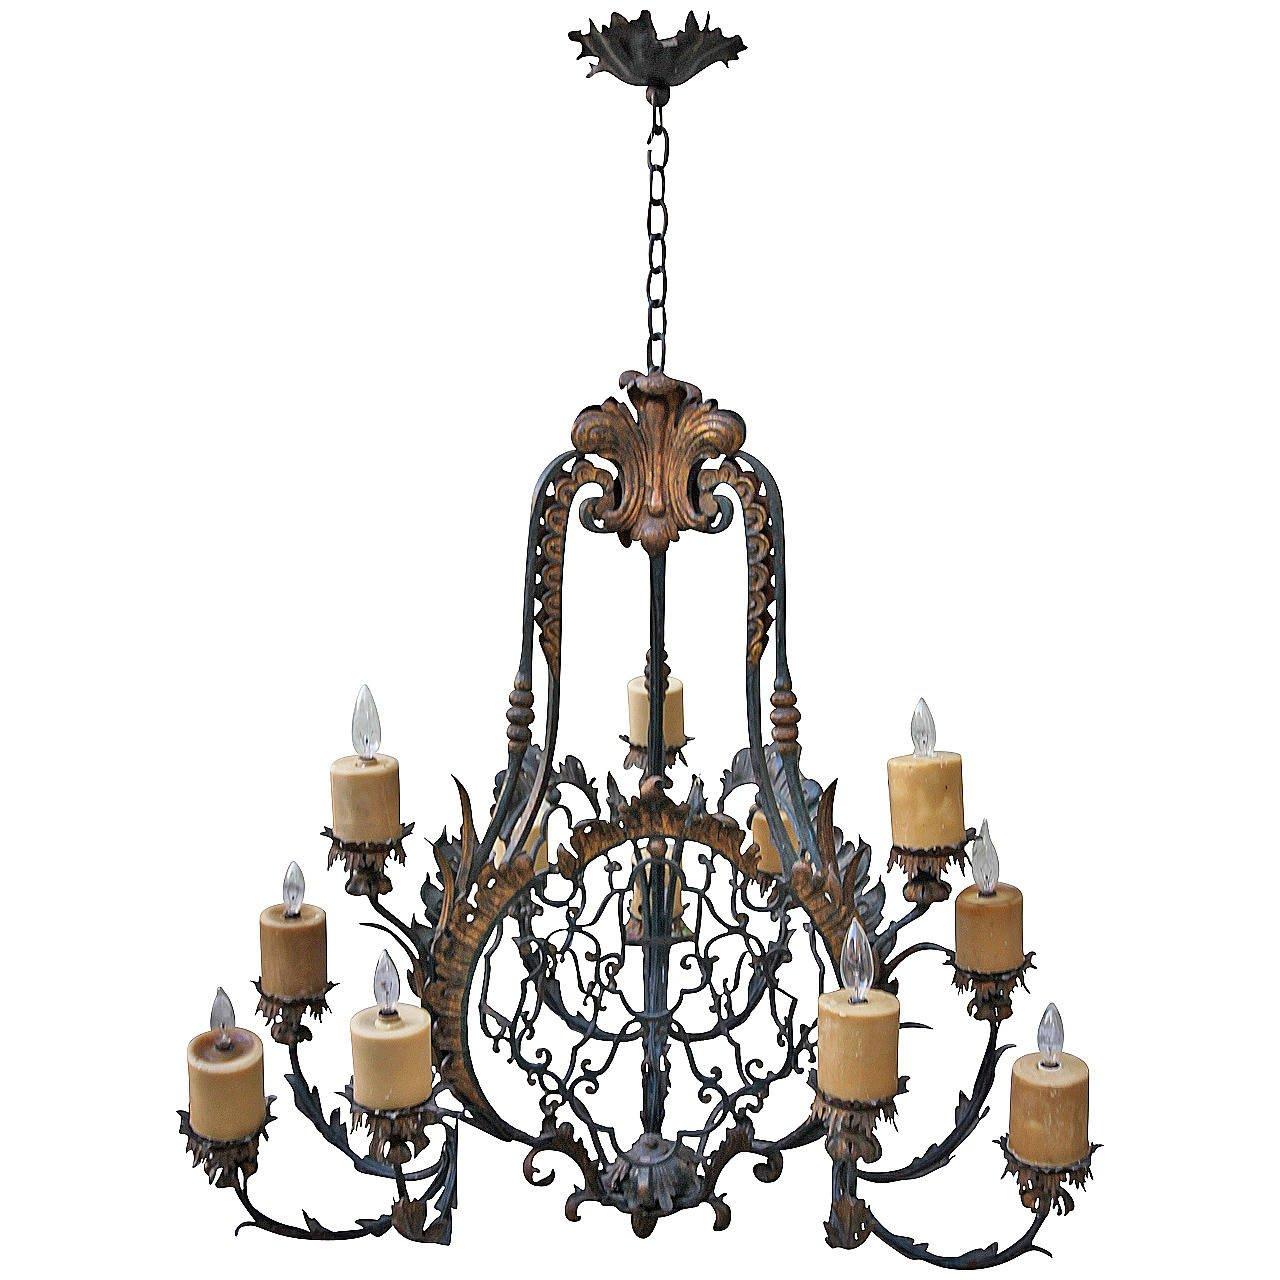 Spanish twelve light wrought iron chandelier melissa levinson antiques spanish twelve light wrought iron chandelier aloadofball Choice Image